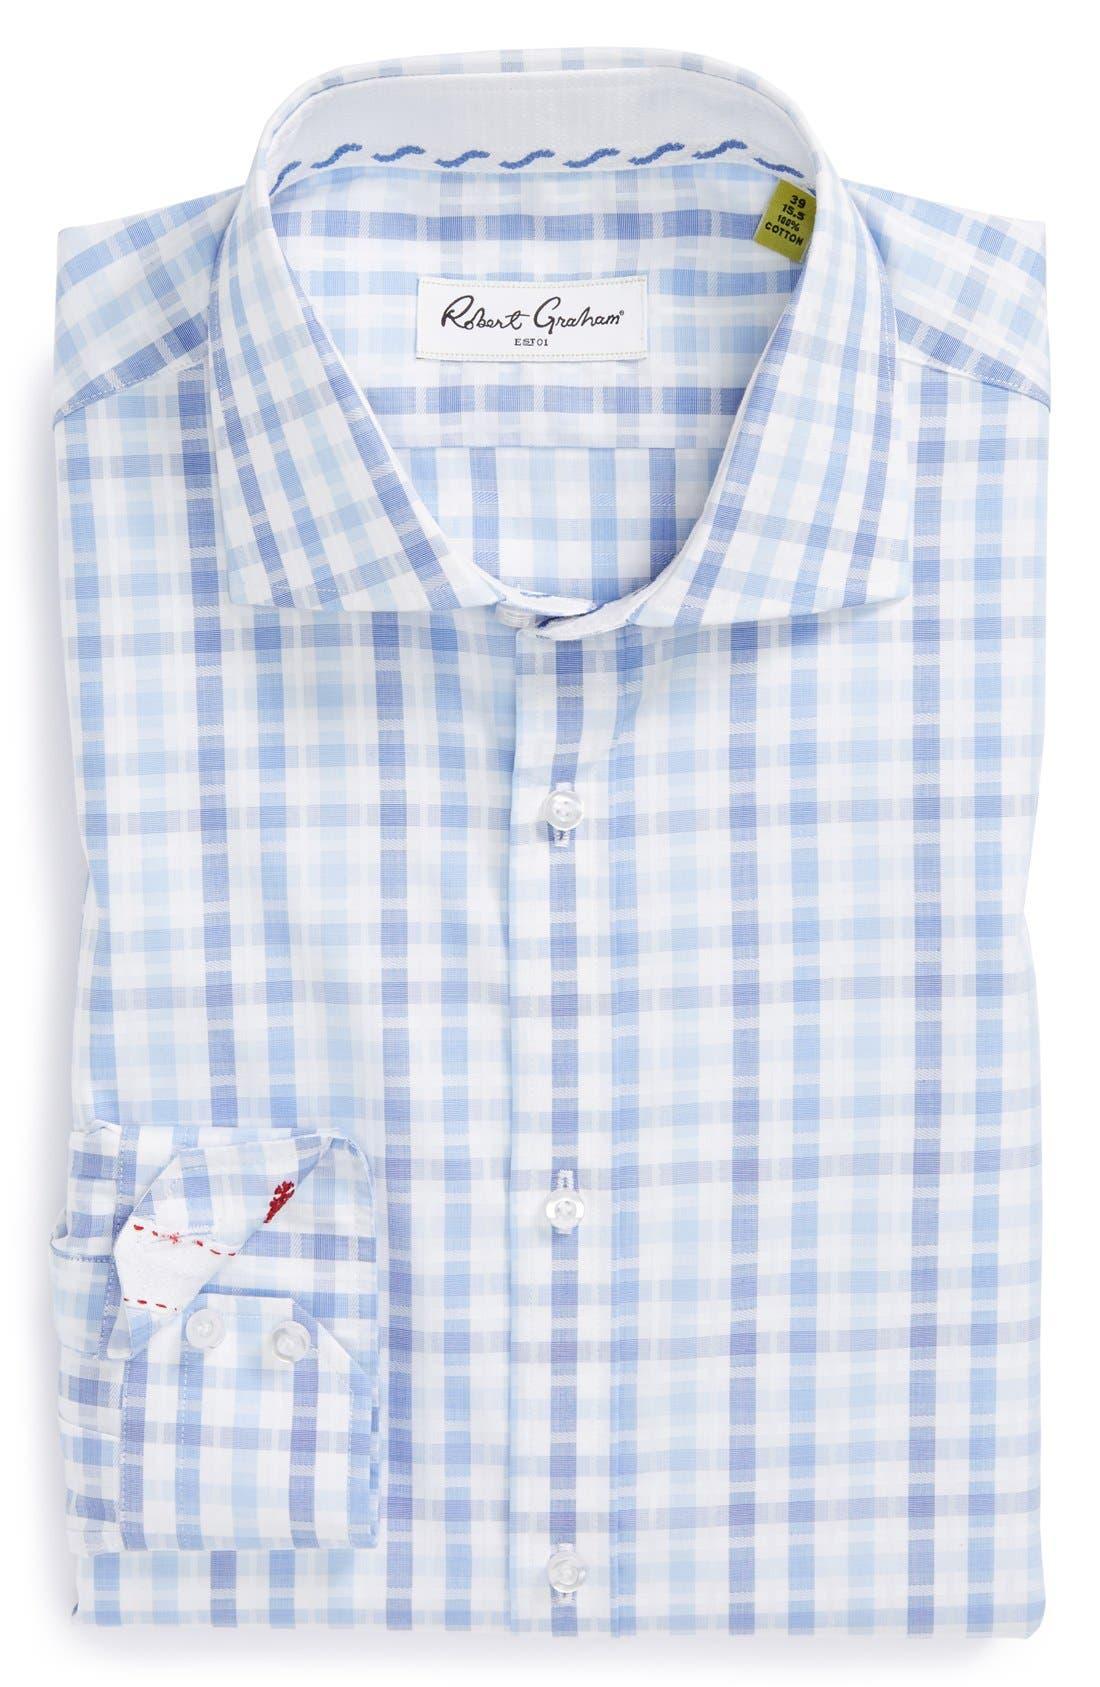 Main Image - Robert Graham 'Ethan' Regular Fit Check Dress Shirt